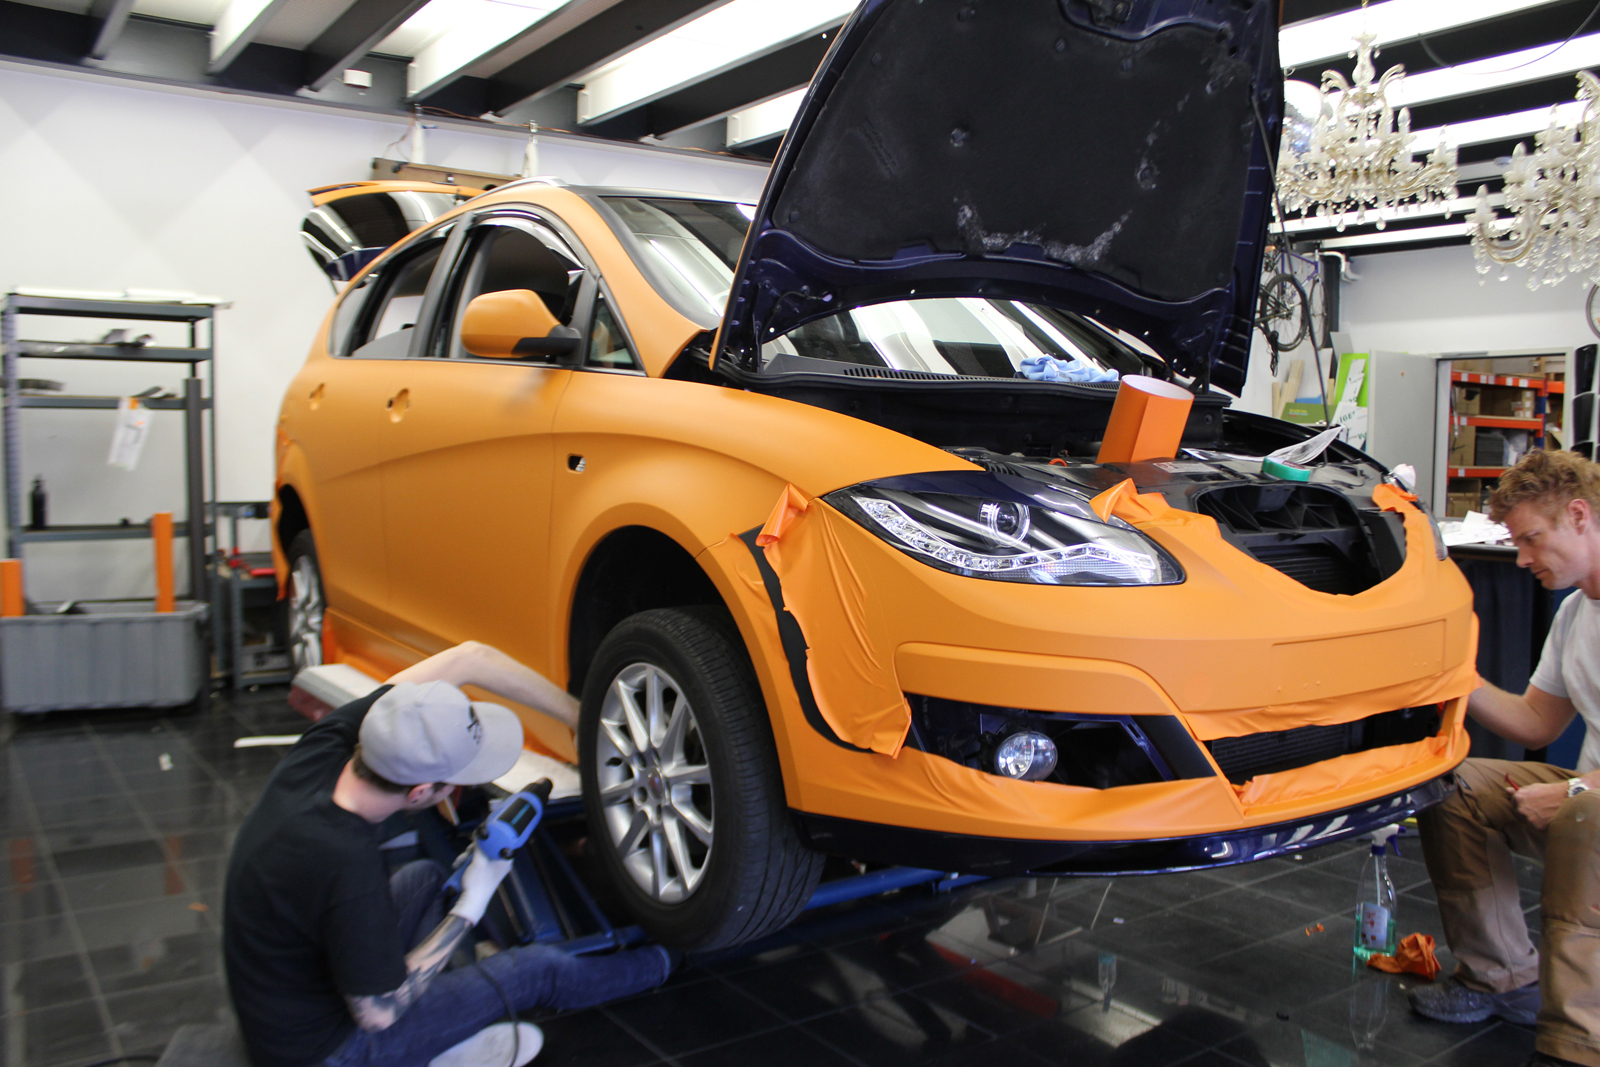 Car Wrapping Auto Folierung Seat Altea XL Orange Matt Schwarz Matt